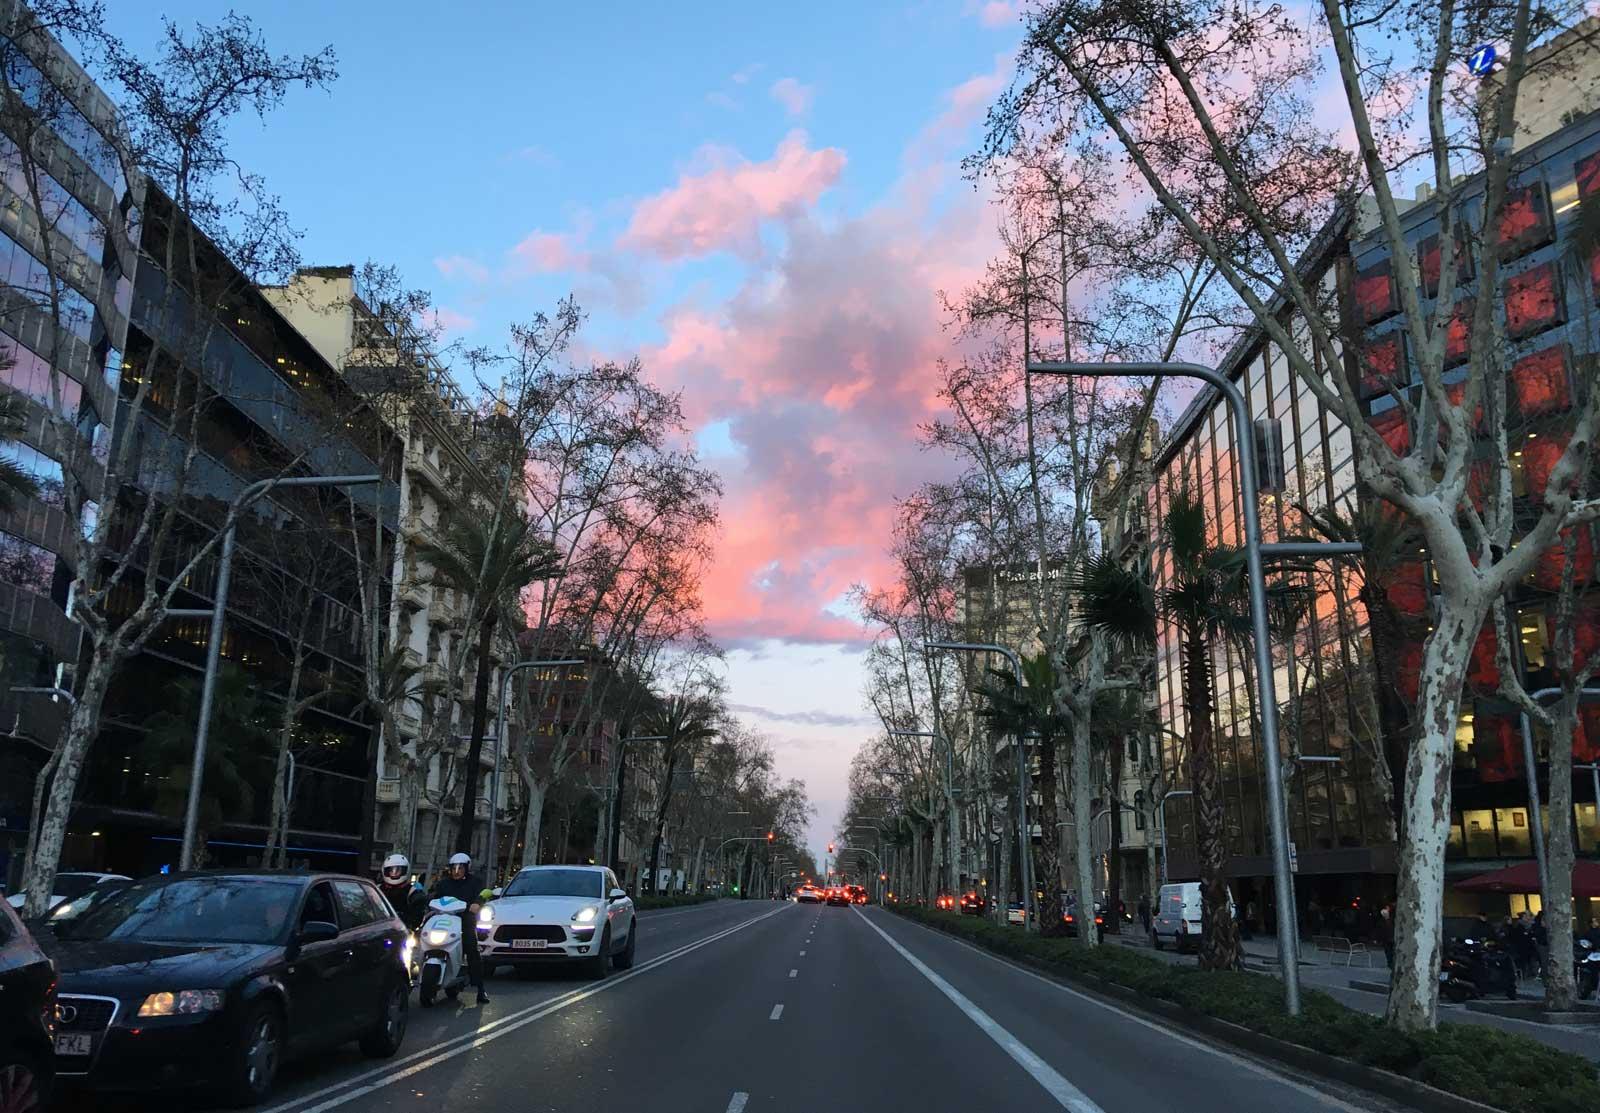 Cruzando Diagonal/Aribau. Barcelona, 20 marzo 2018